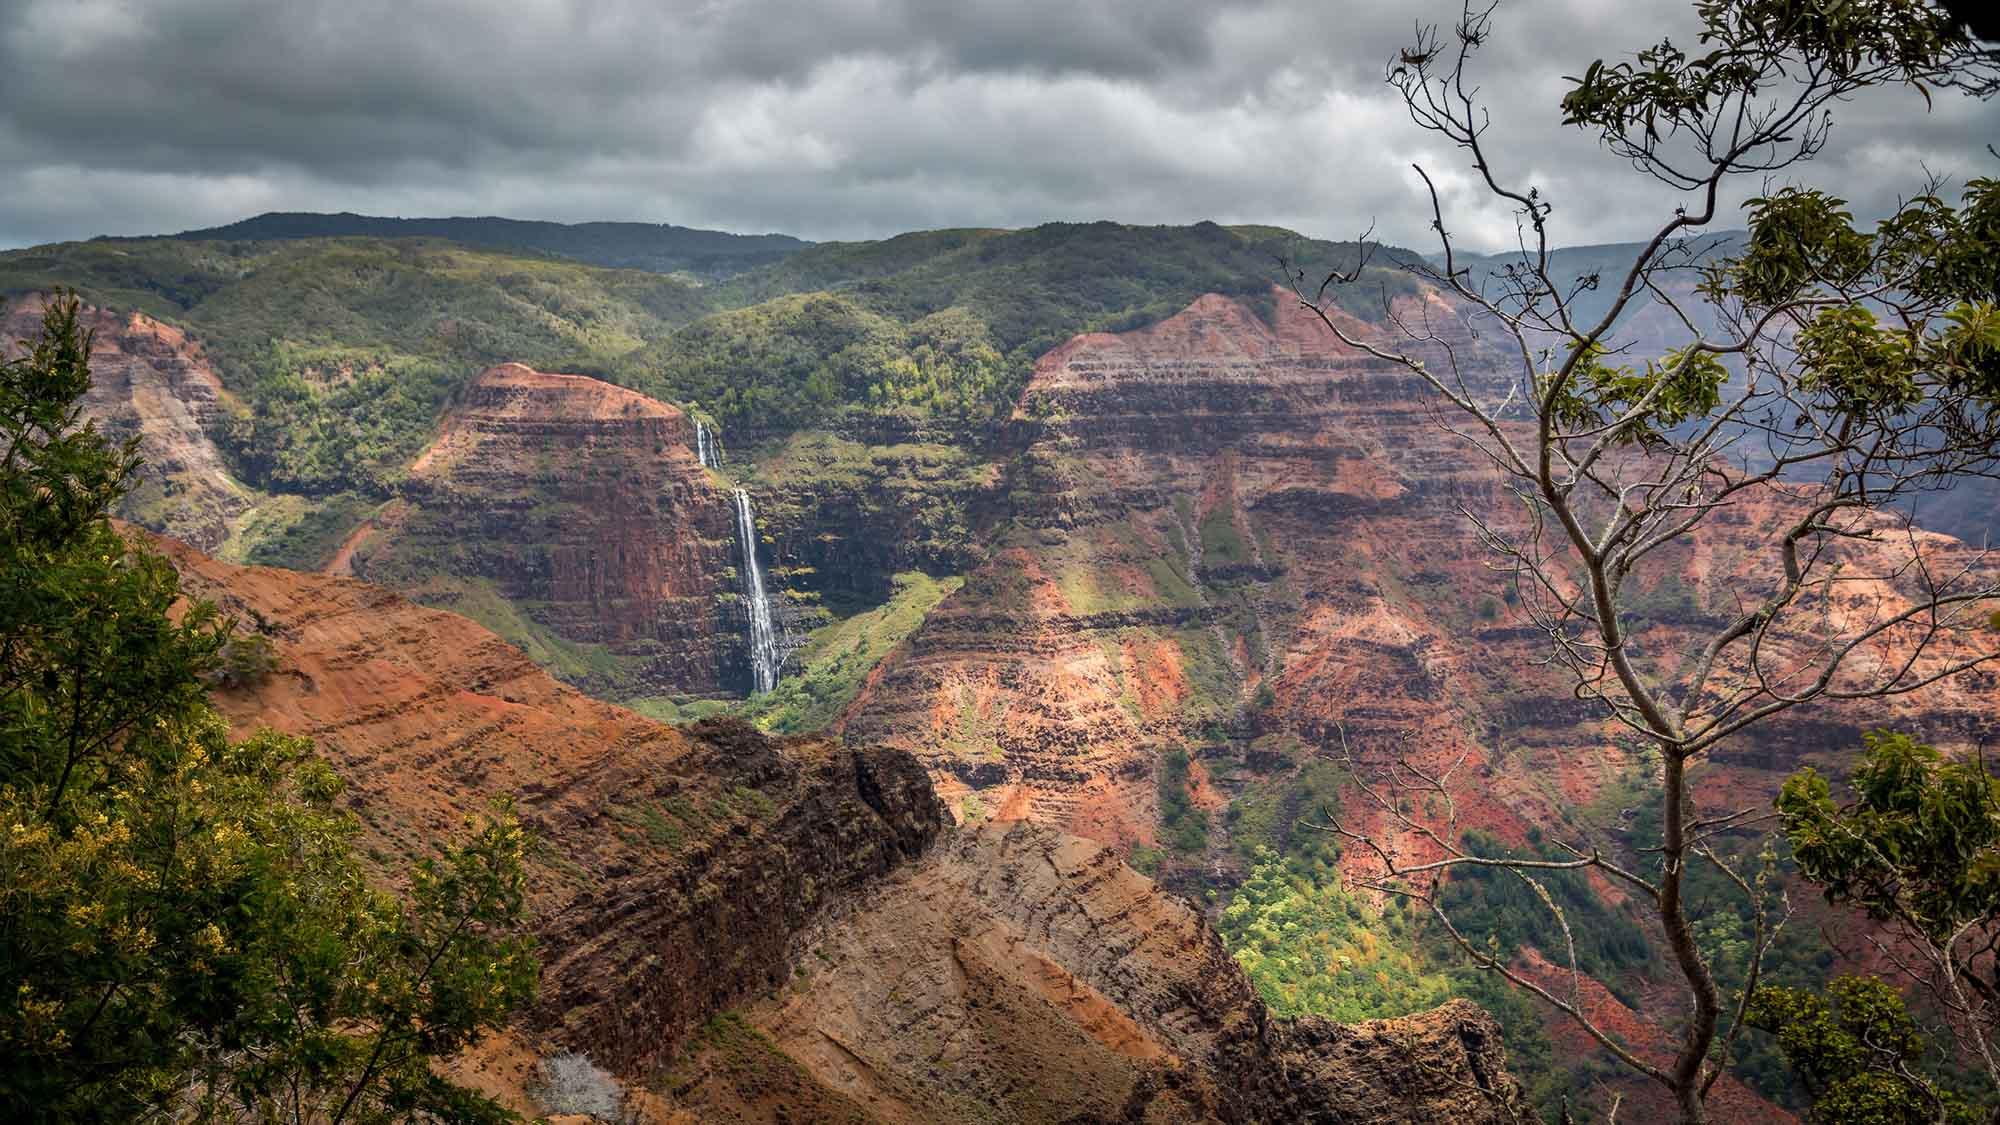 88544486 - waipoo falls in waimea canyon, kauai, hawaii.